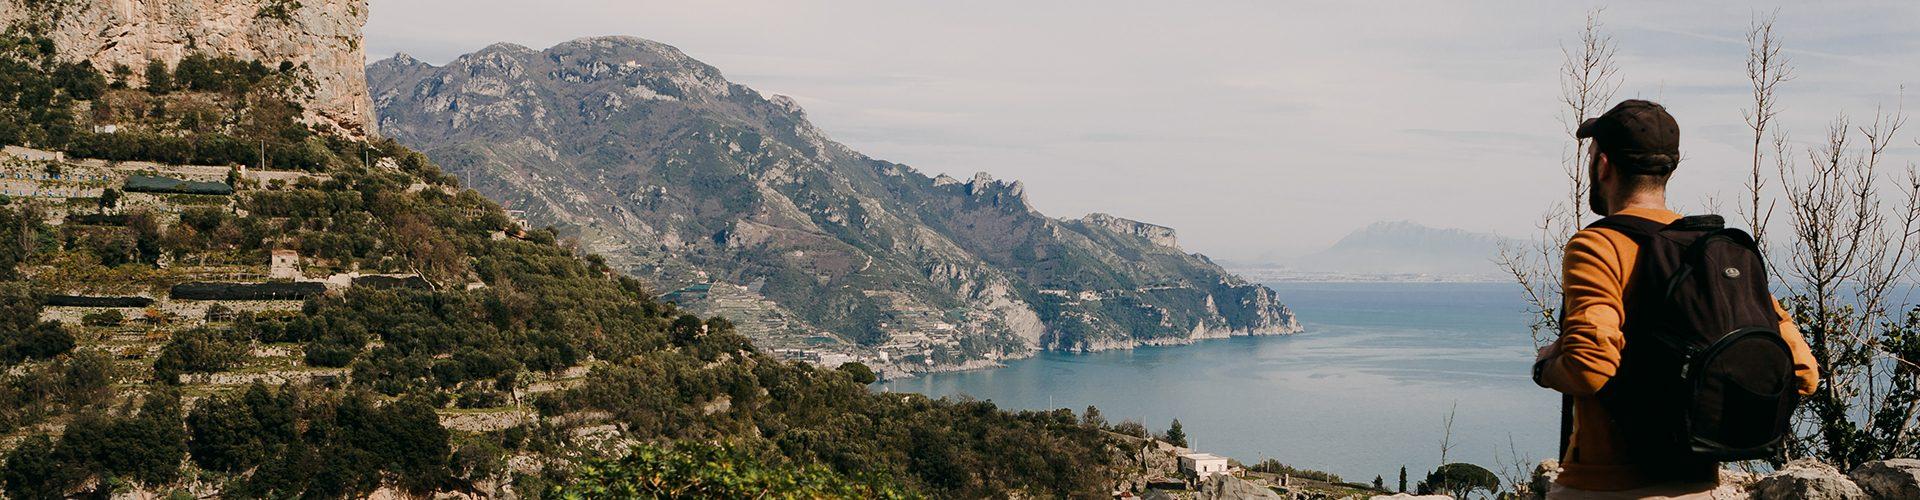 Walking through Amalfi Coast